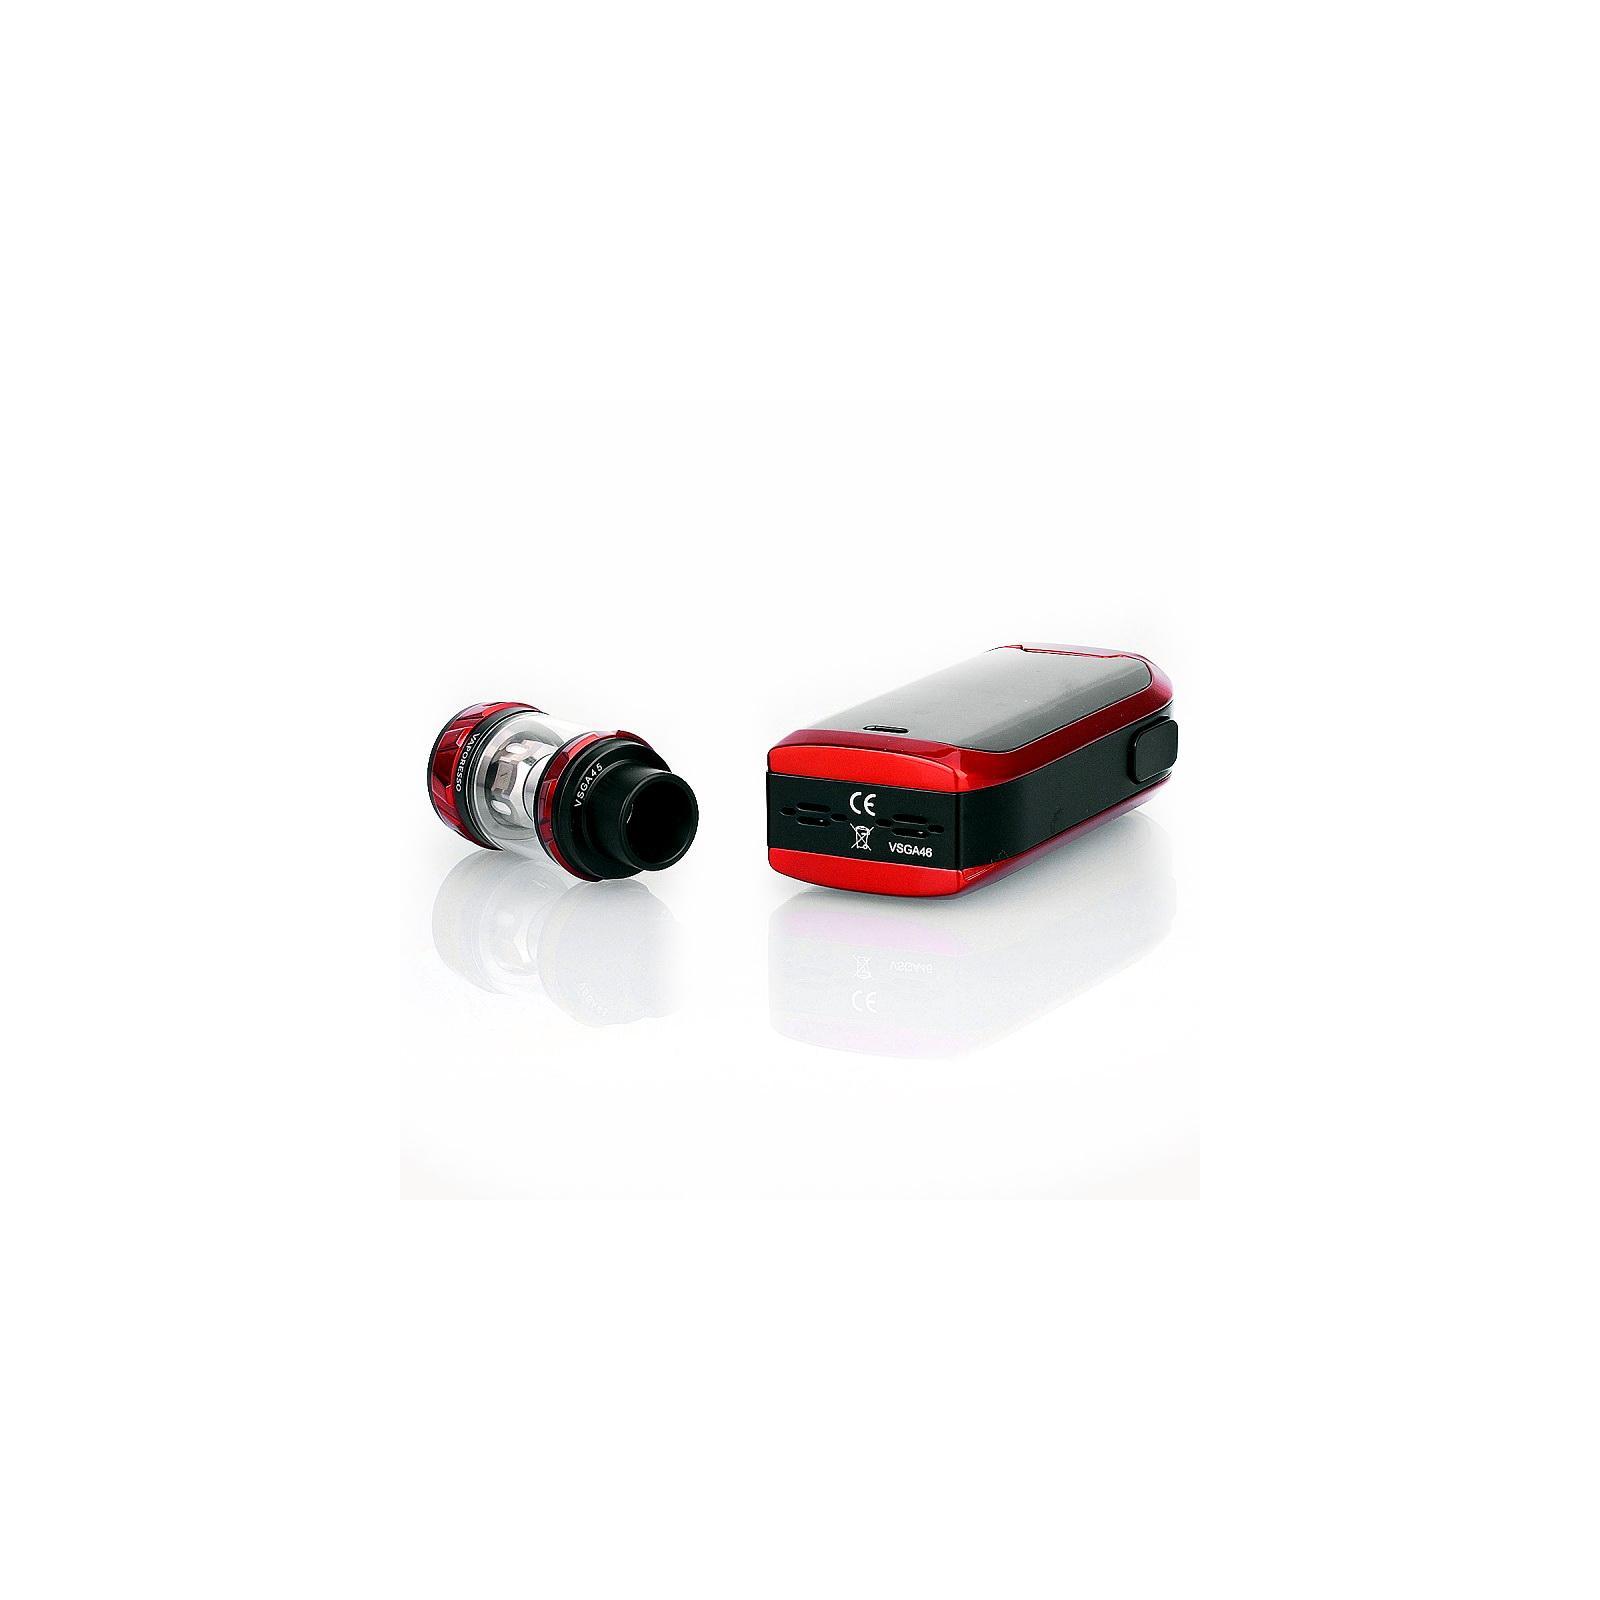 Стартовый набор Vaporesso Revenger X Kit with NRG Tank Red (VRVNXR) изображение 4